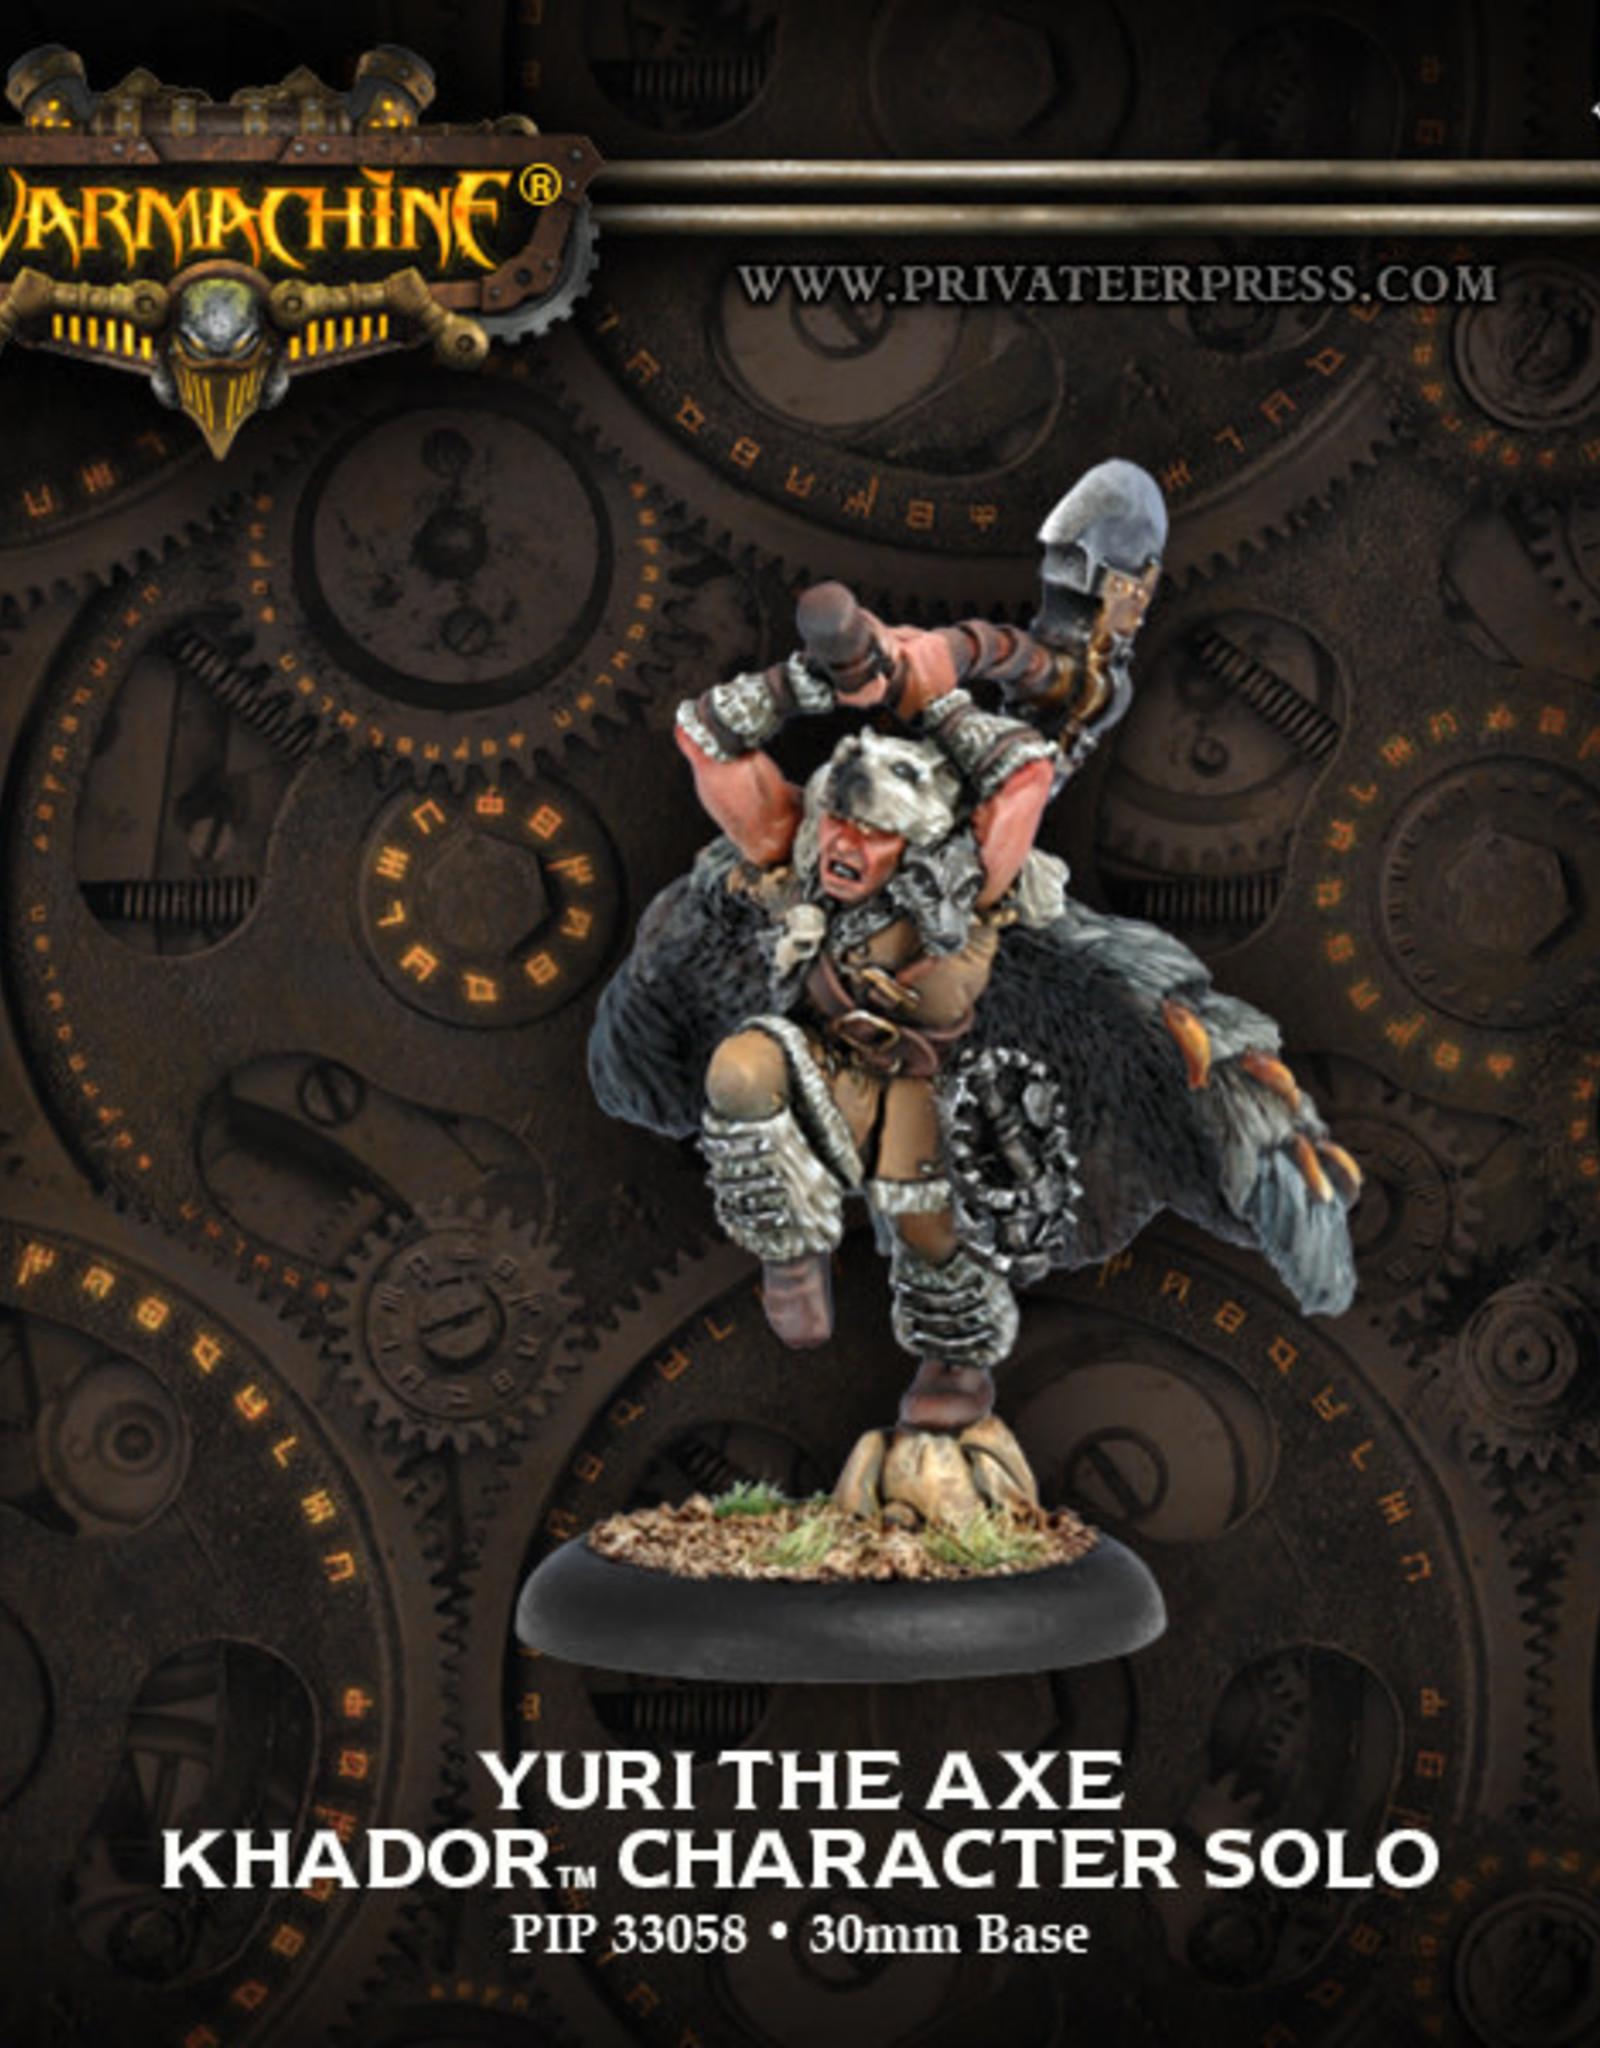 Warmachine Khador Yuri the Axe